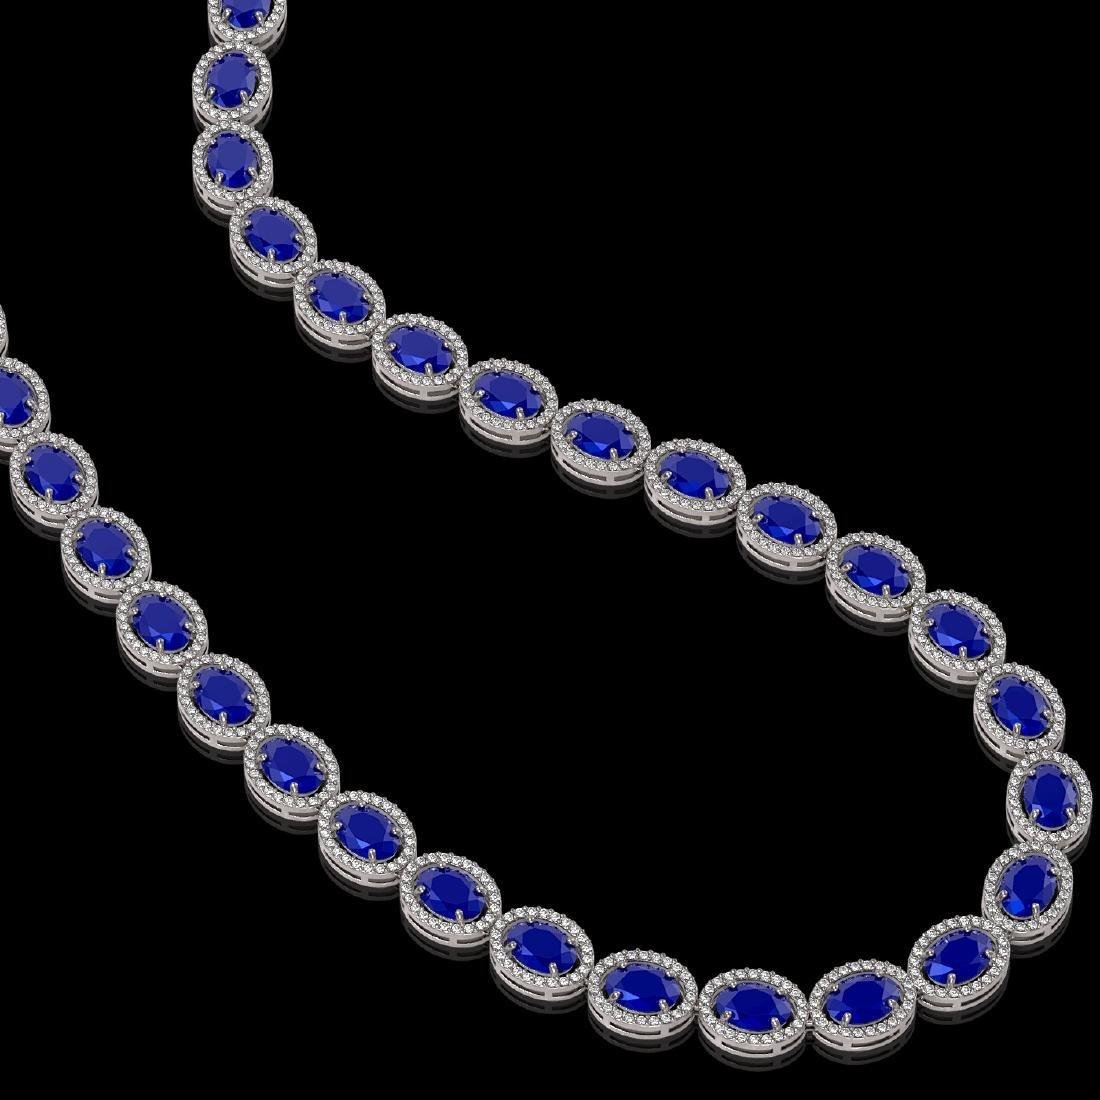 52.15 CTW Sapphire & Diamond Halo Necklace 10K White - 2